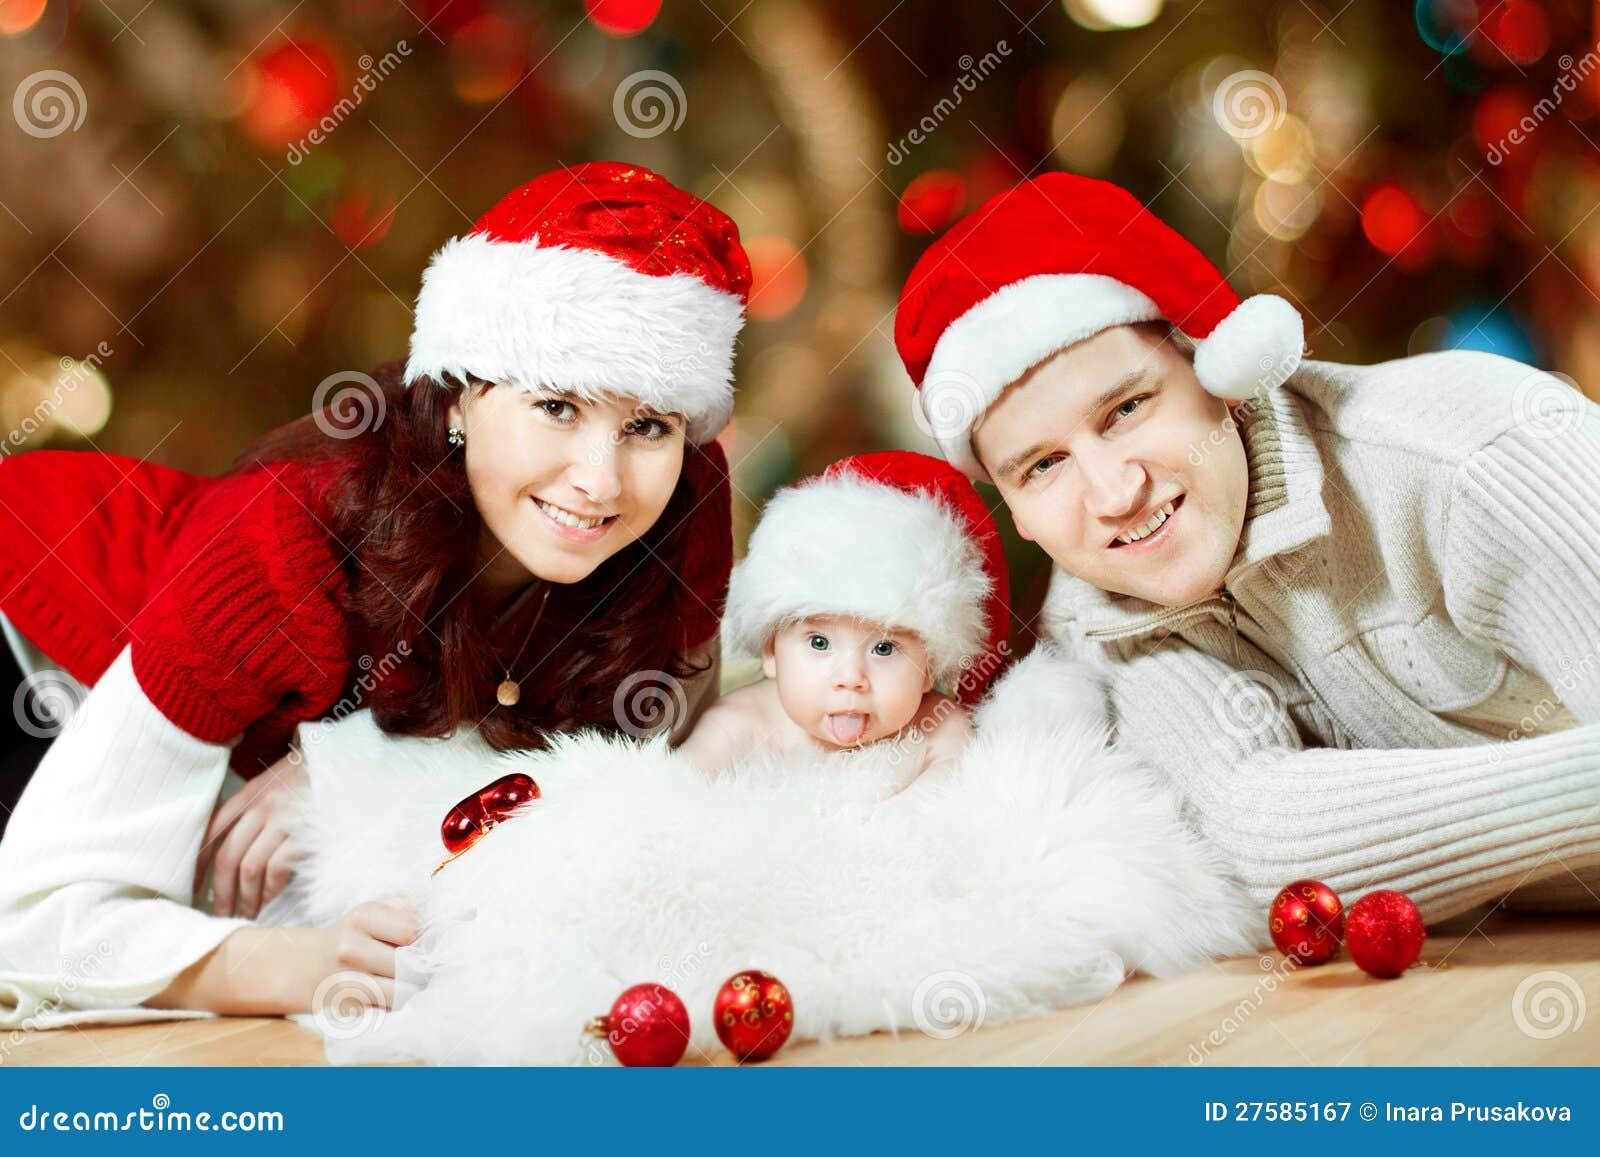 Foto Di Natale Famiglia.Una Famiglia Di Natale Di Tre Persone In Cappelli Rossi